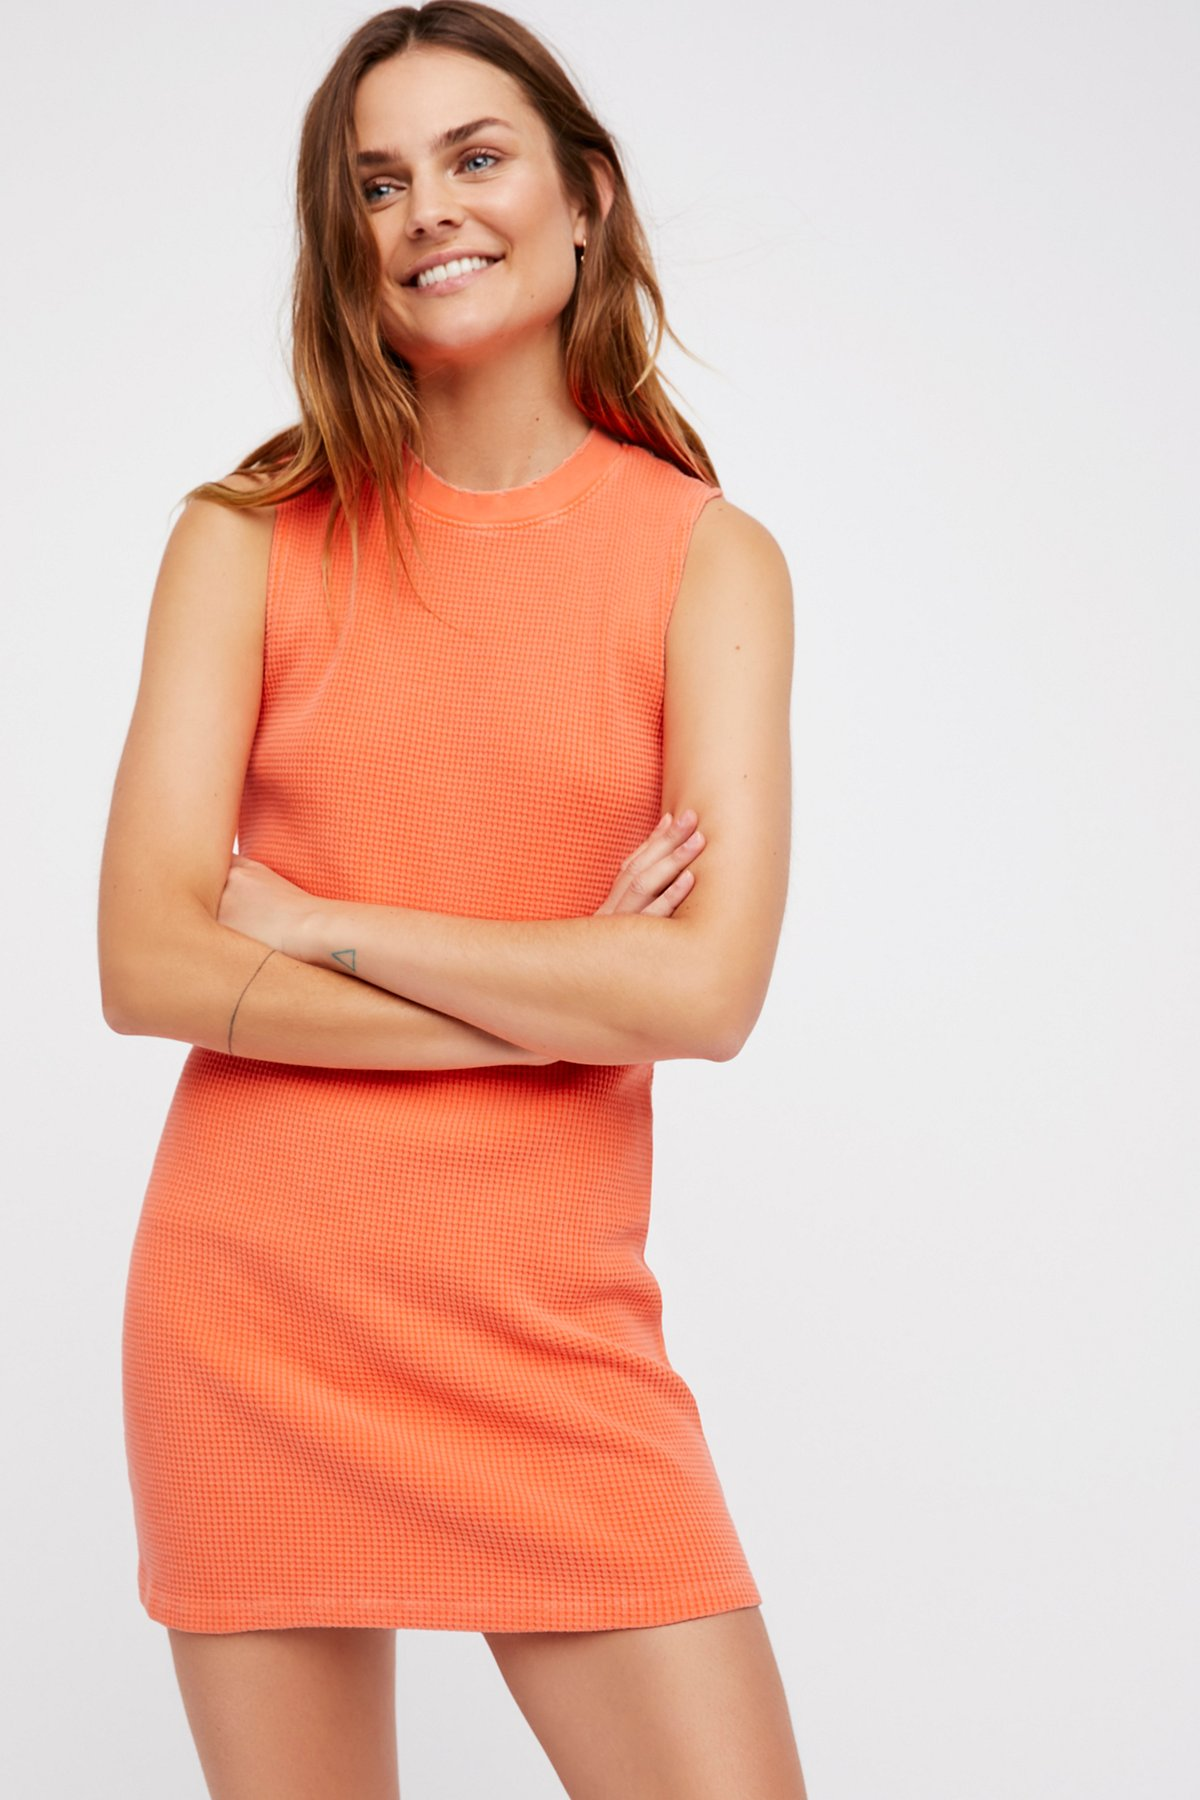 Monaco Thermal Mini Dress